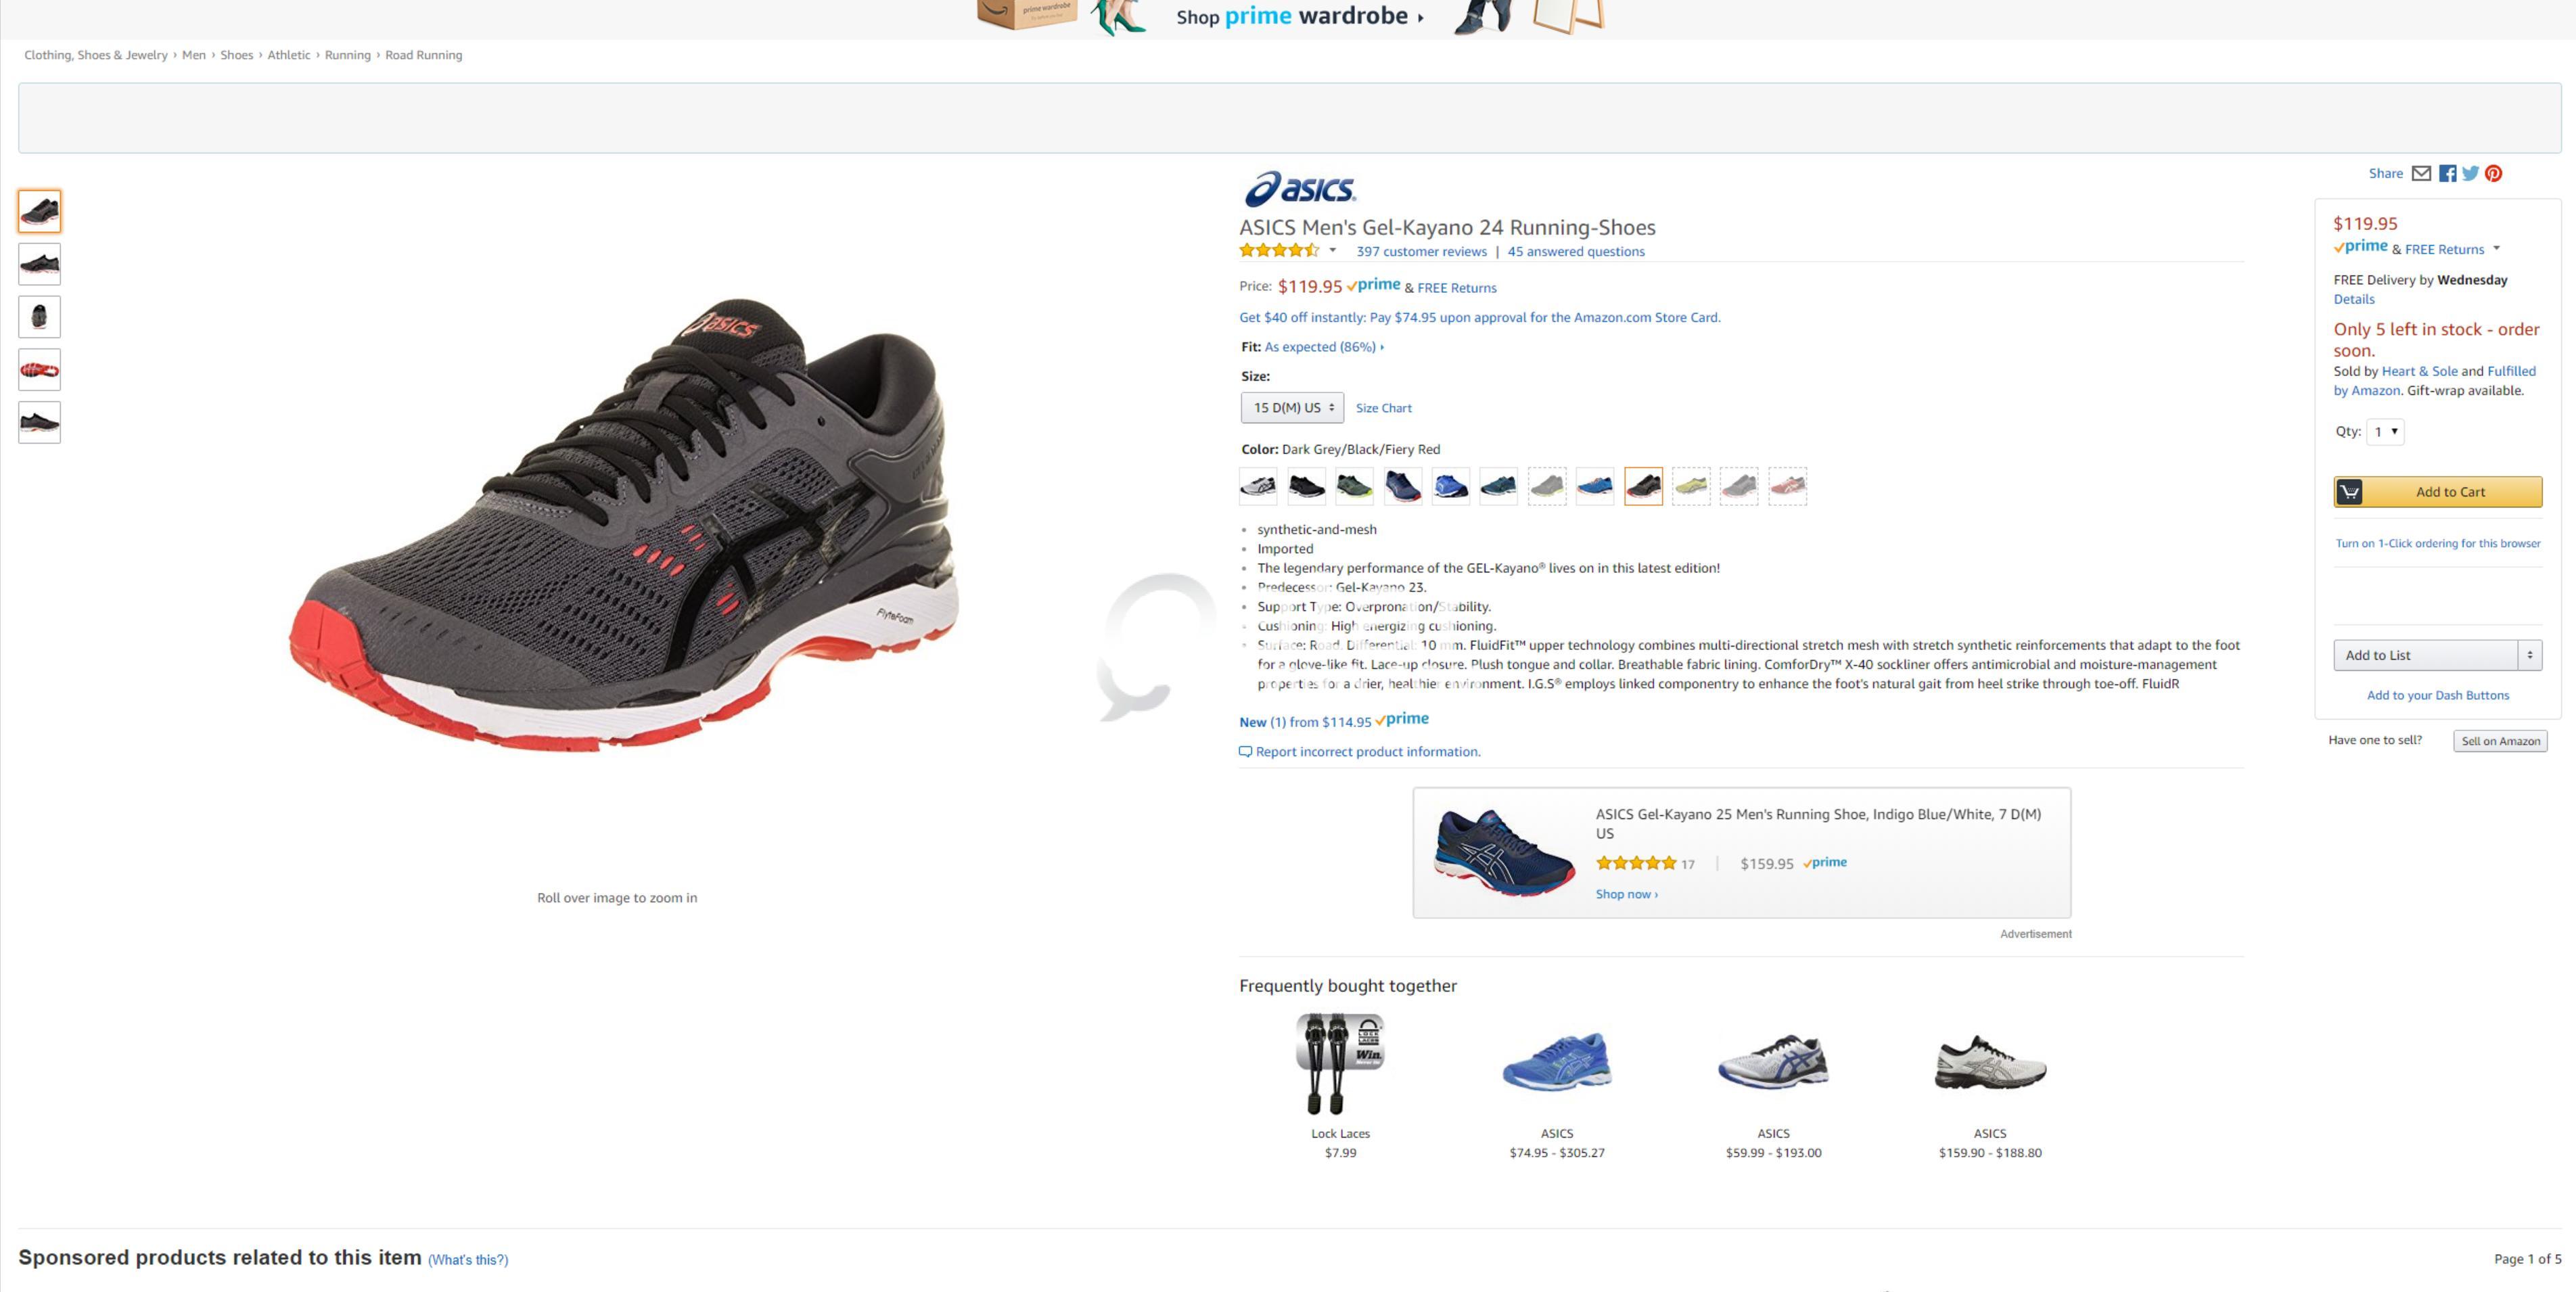 c5bfb3846c5e1 SNEAKERS ASICS Men's Gel-Kayano 24 Running-Shoes | Qatar Living